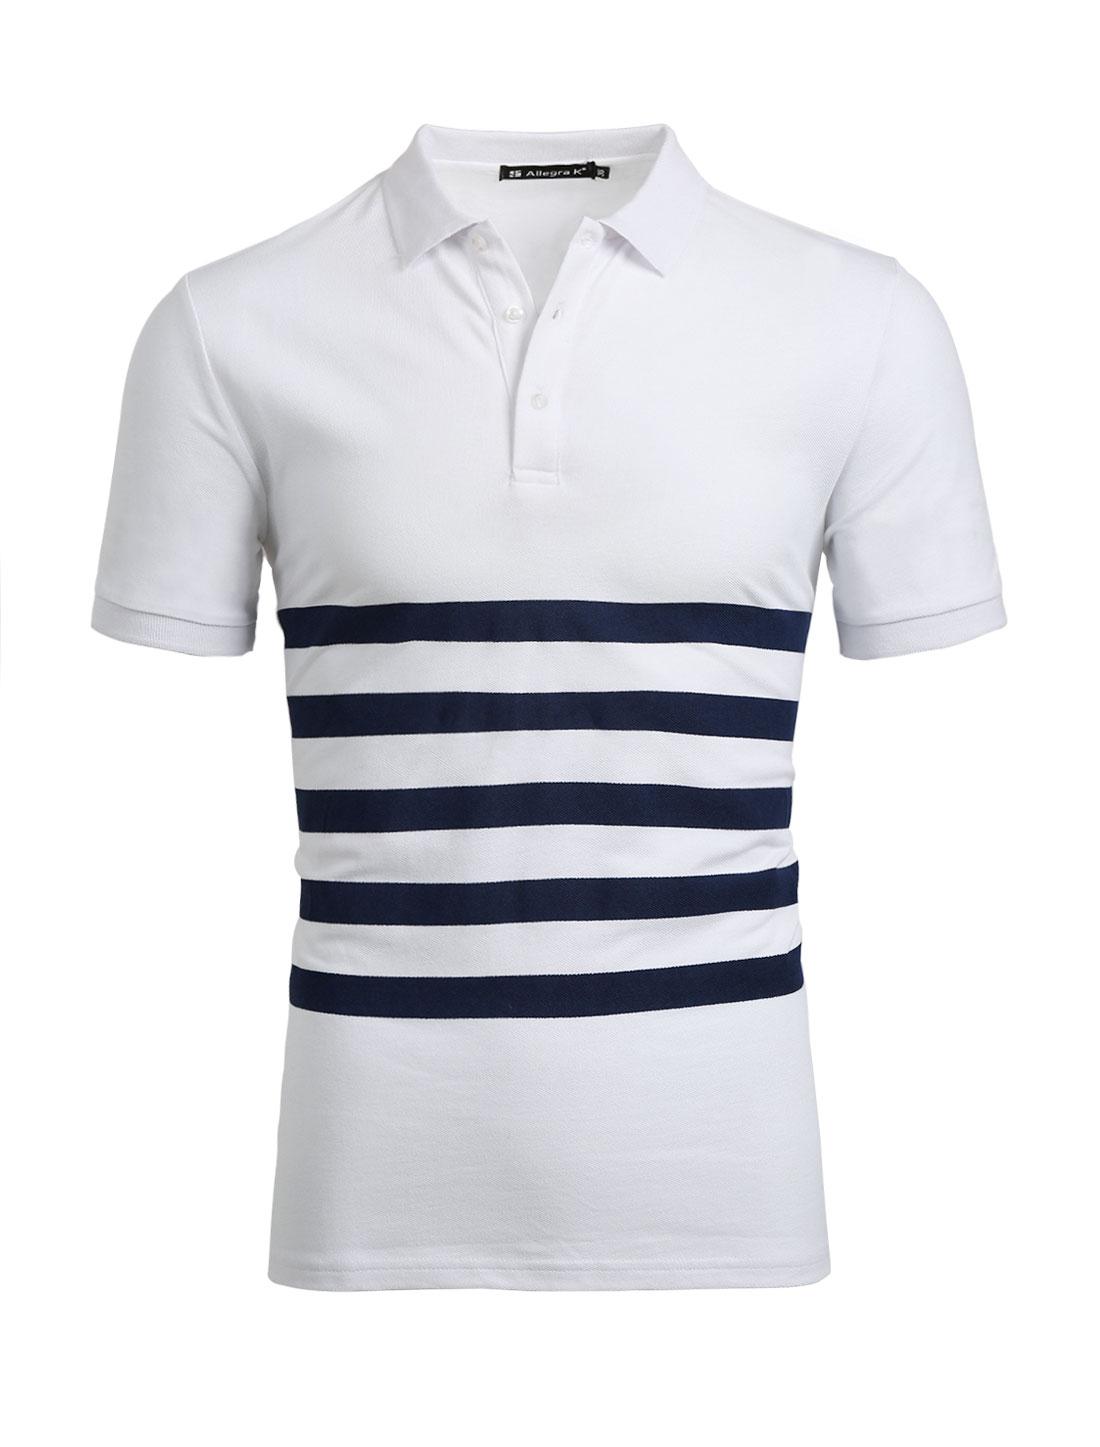 Men Half Placket Buttoned Short Sleeves Stripes Tee Shirt White S